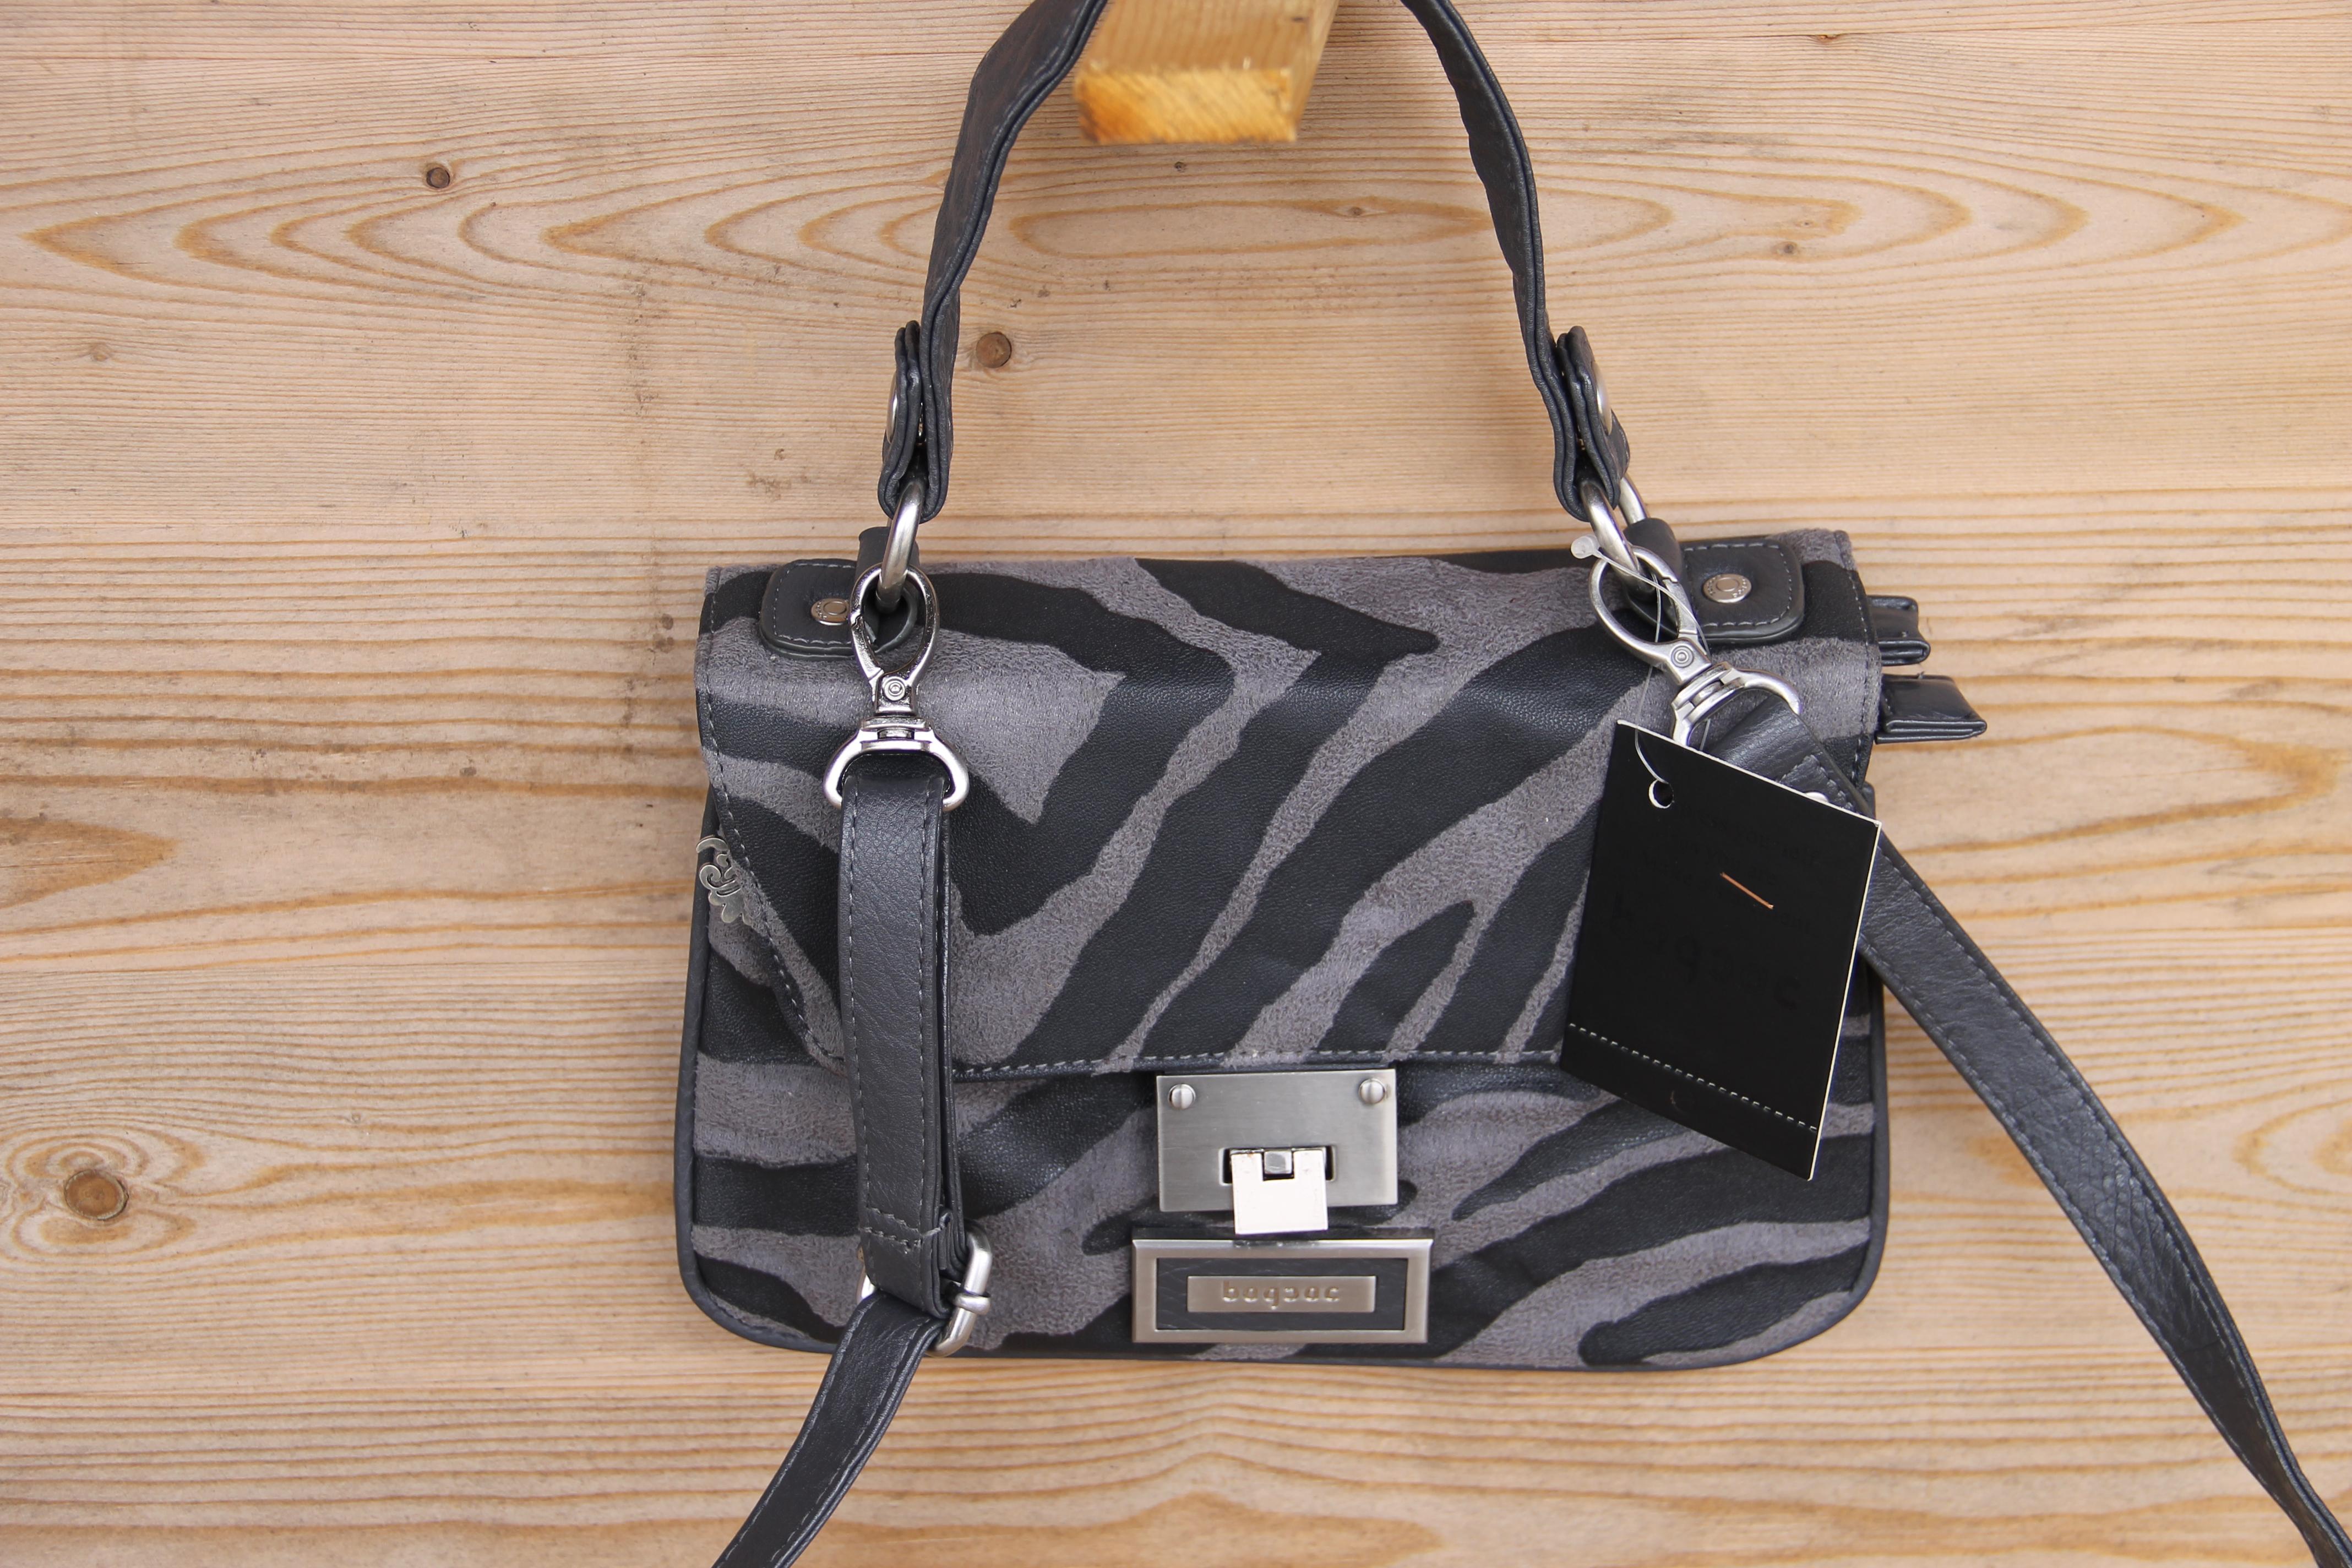 fdcbb3a65e4 Design Bagsac tas #23 | JouwVeilingen.nl webshop